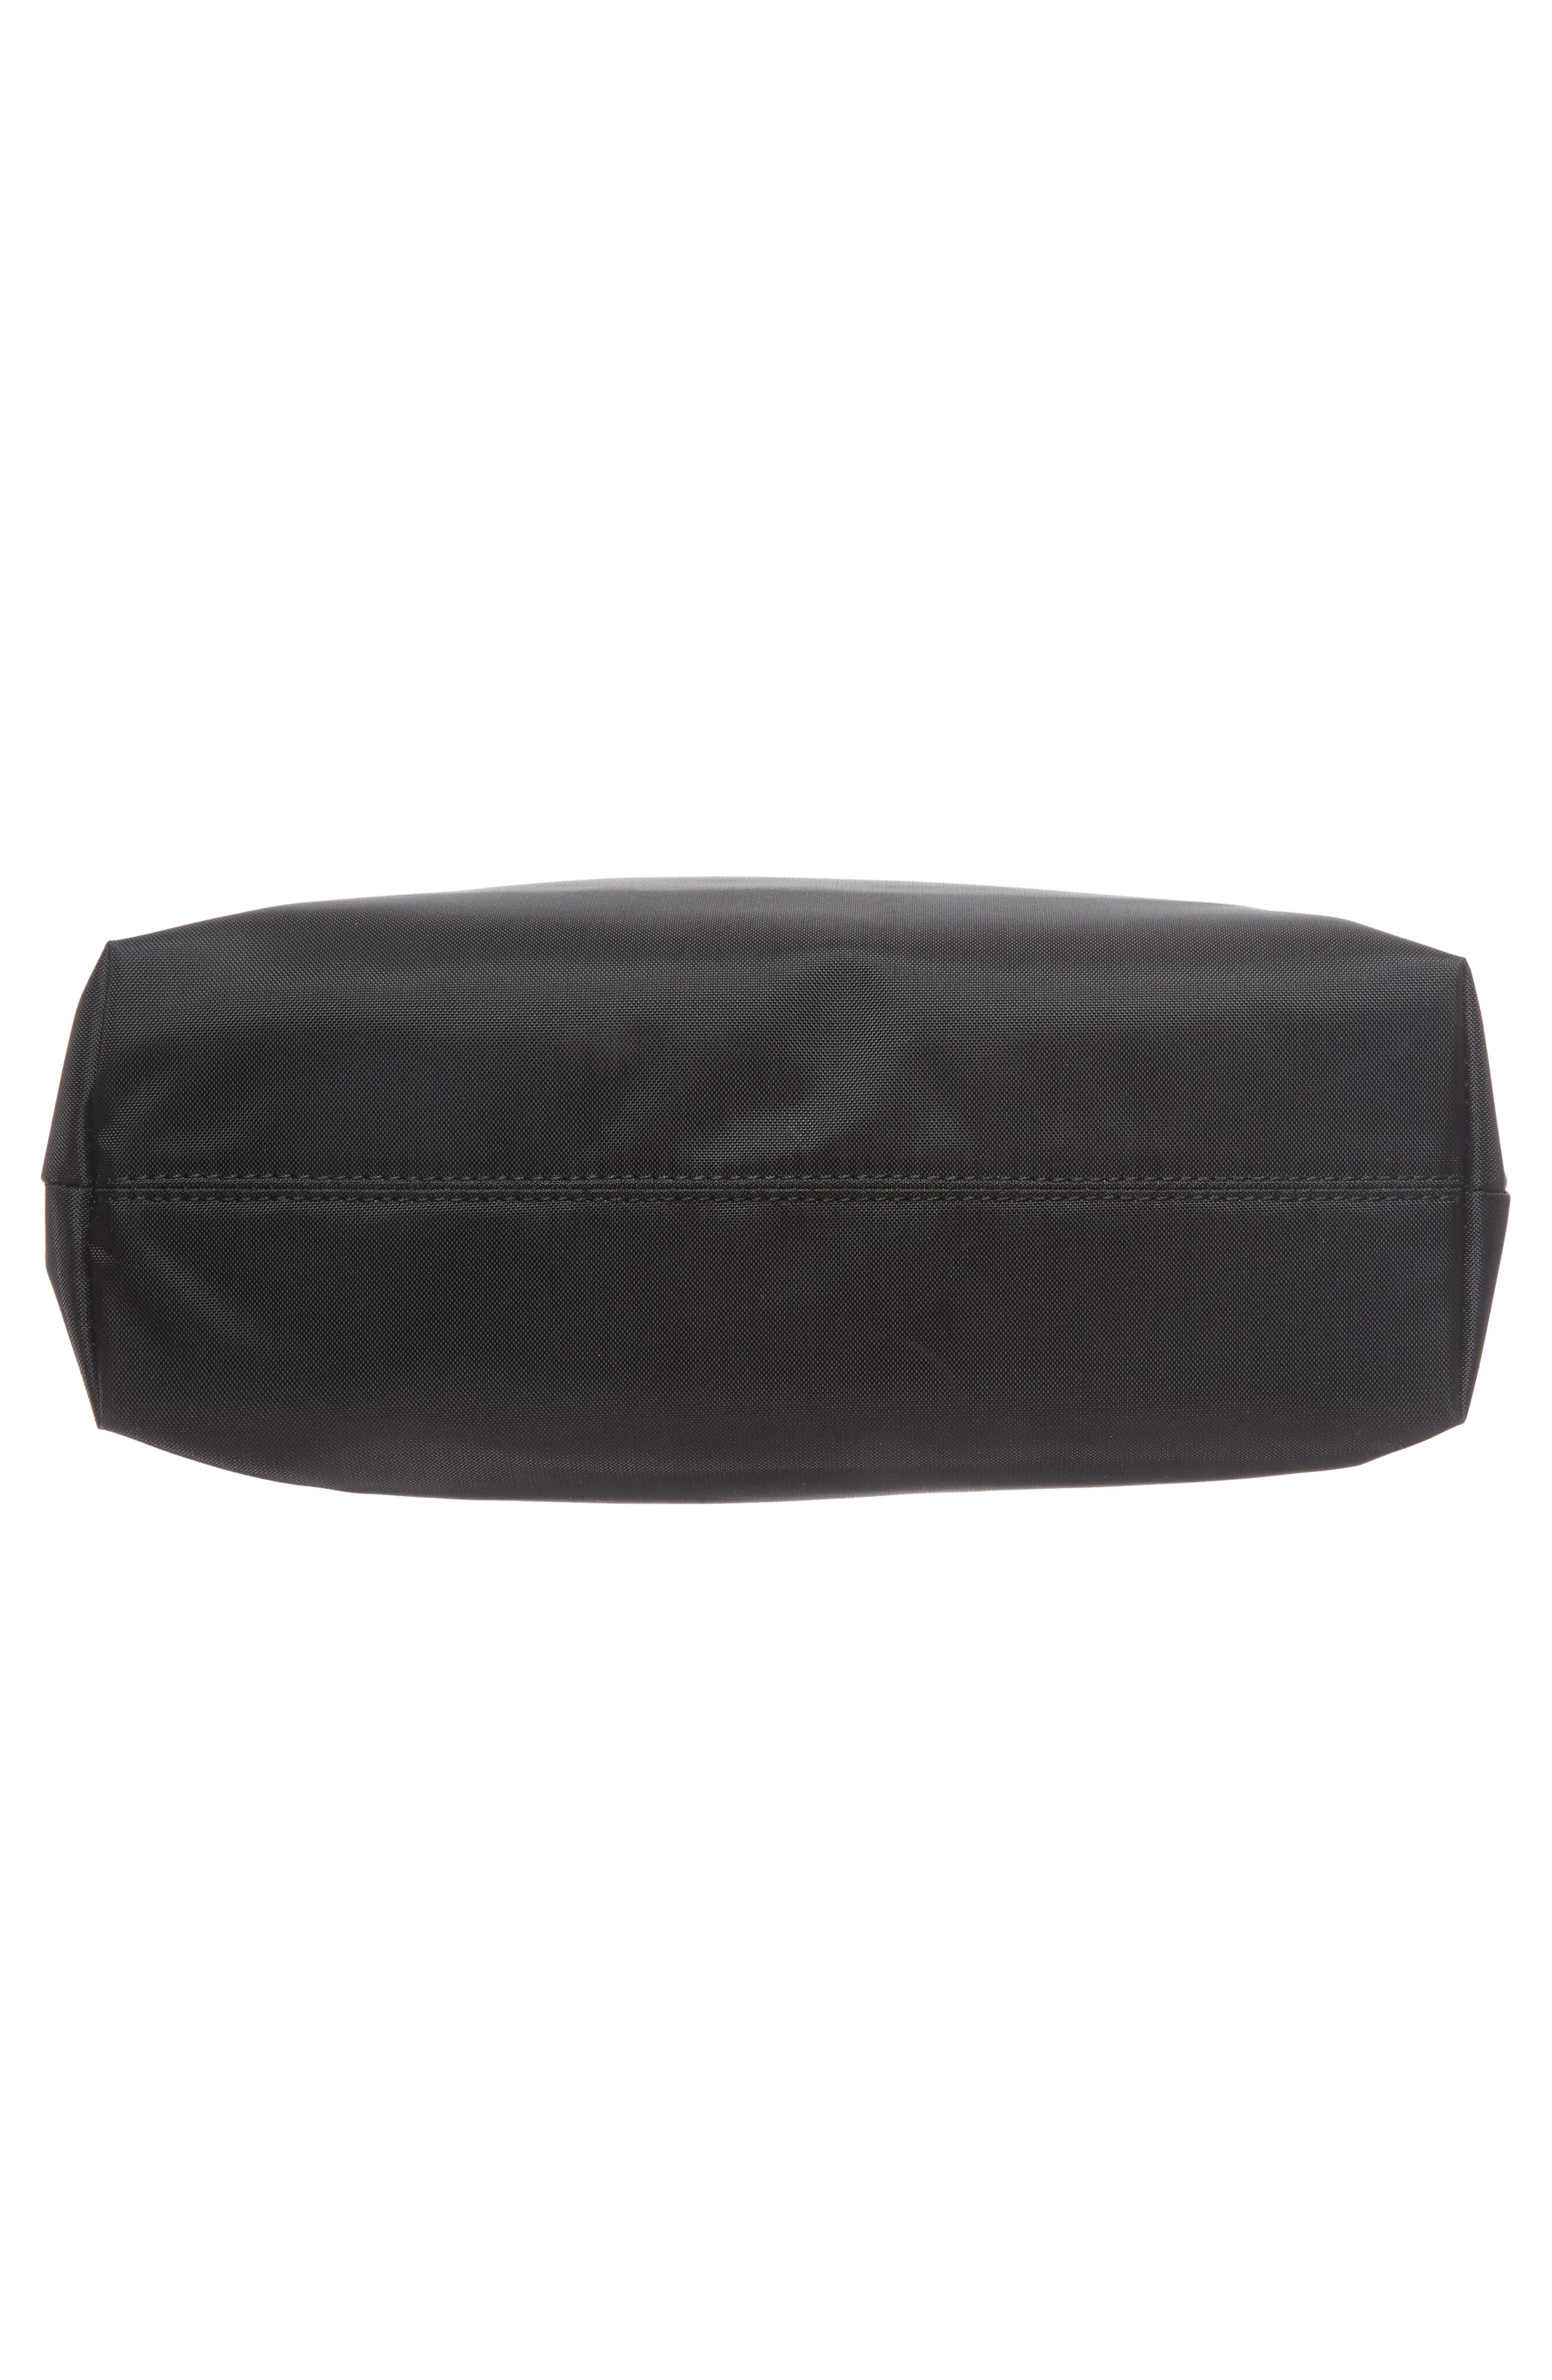 Halogen Nylon Crossbody Bag,                             Alternate thumbnail 6, color,                             001